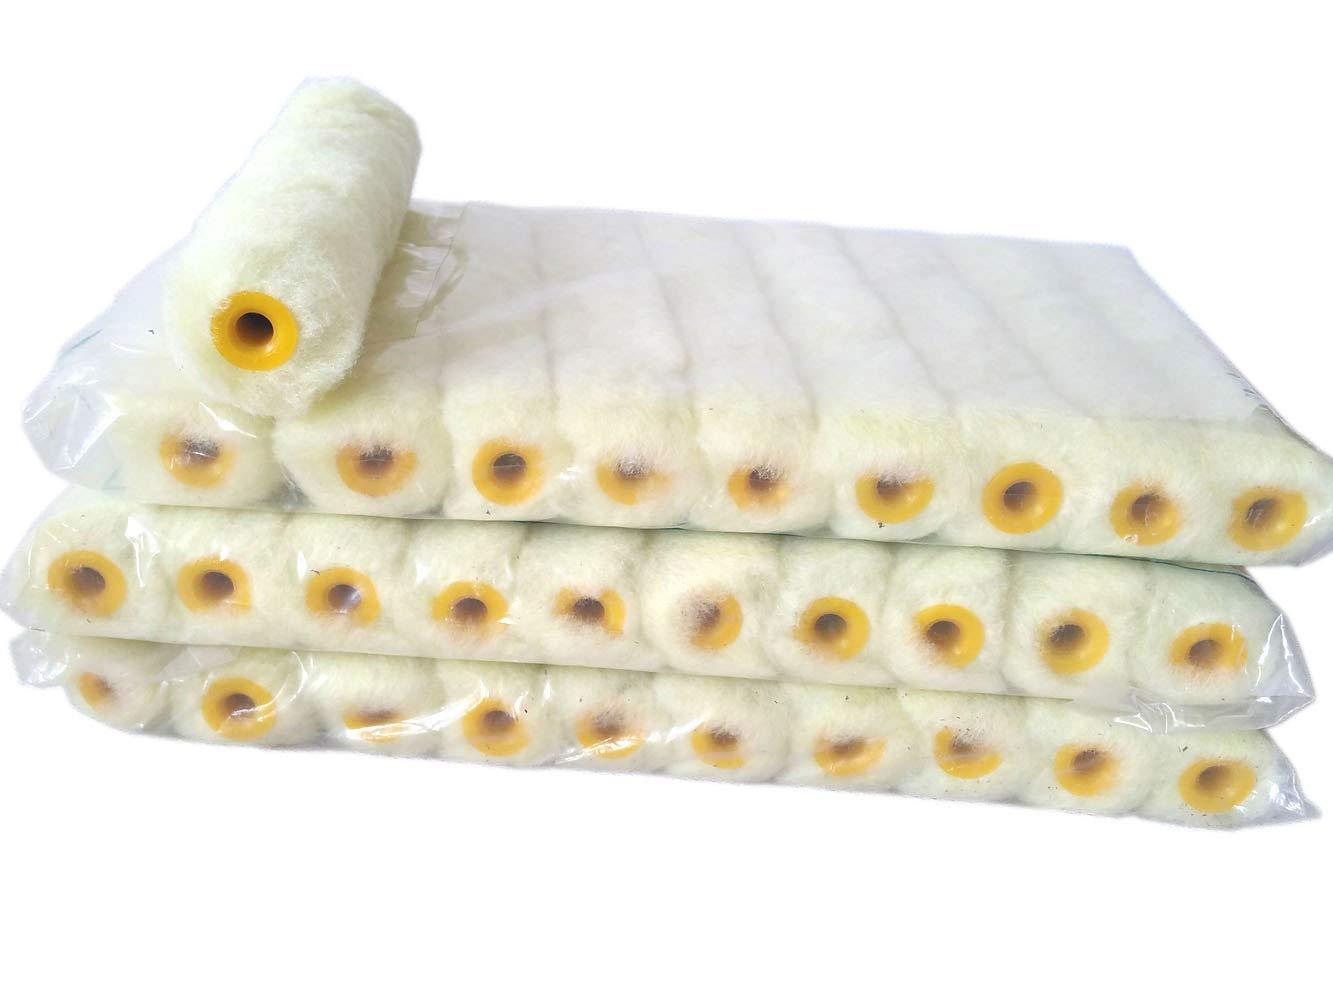 Rong 30 Roller Covers 6 inch Mini Cover Refill White Stripe Soft Woven 2/5 RH Ltd